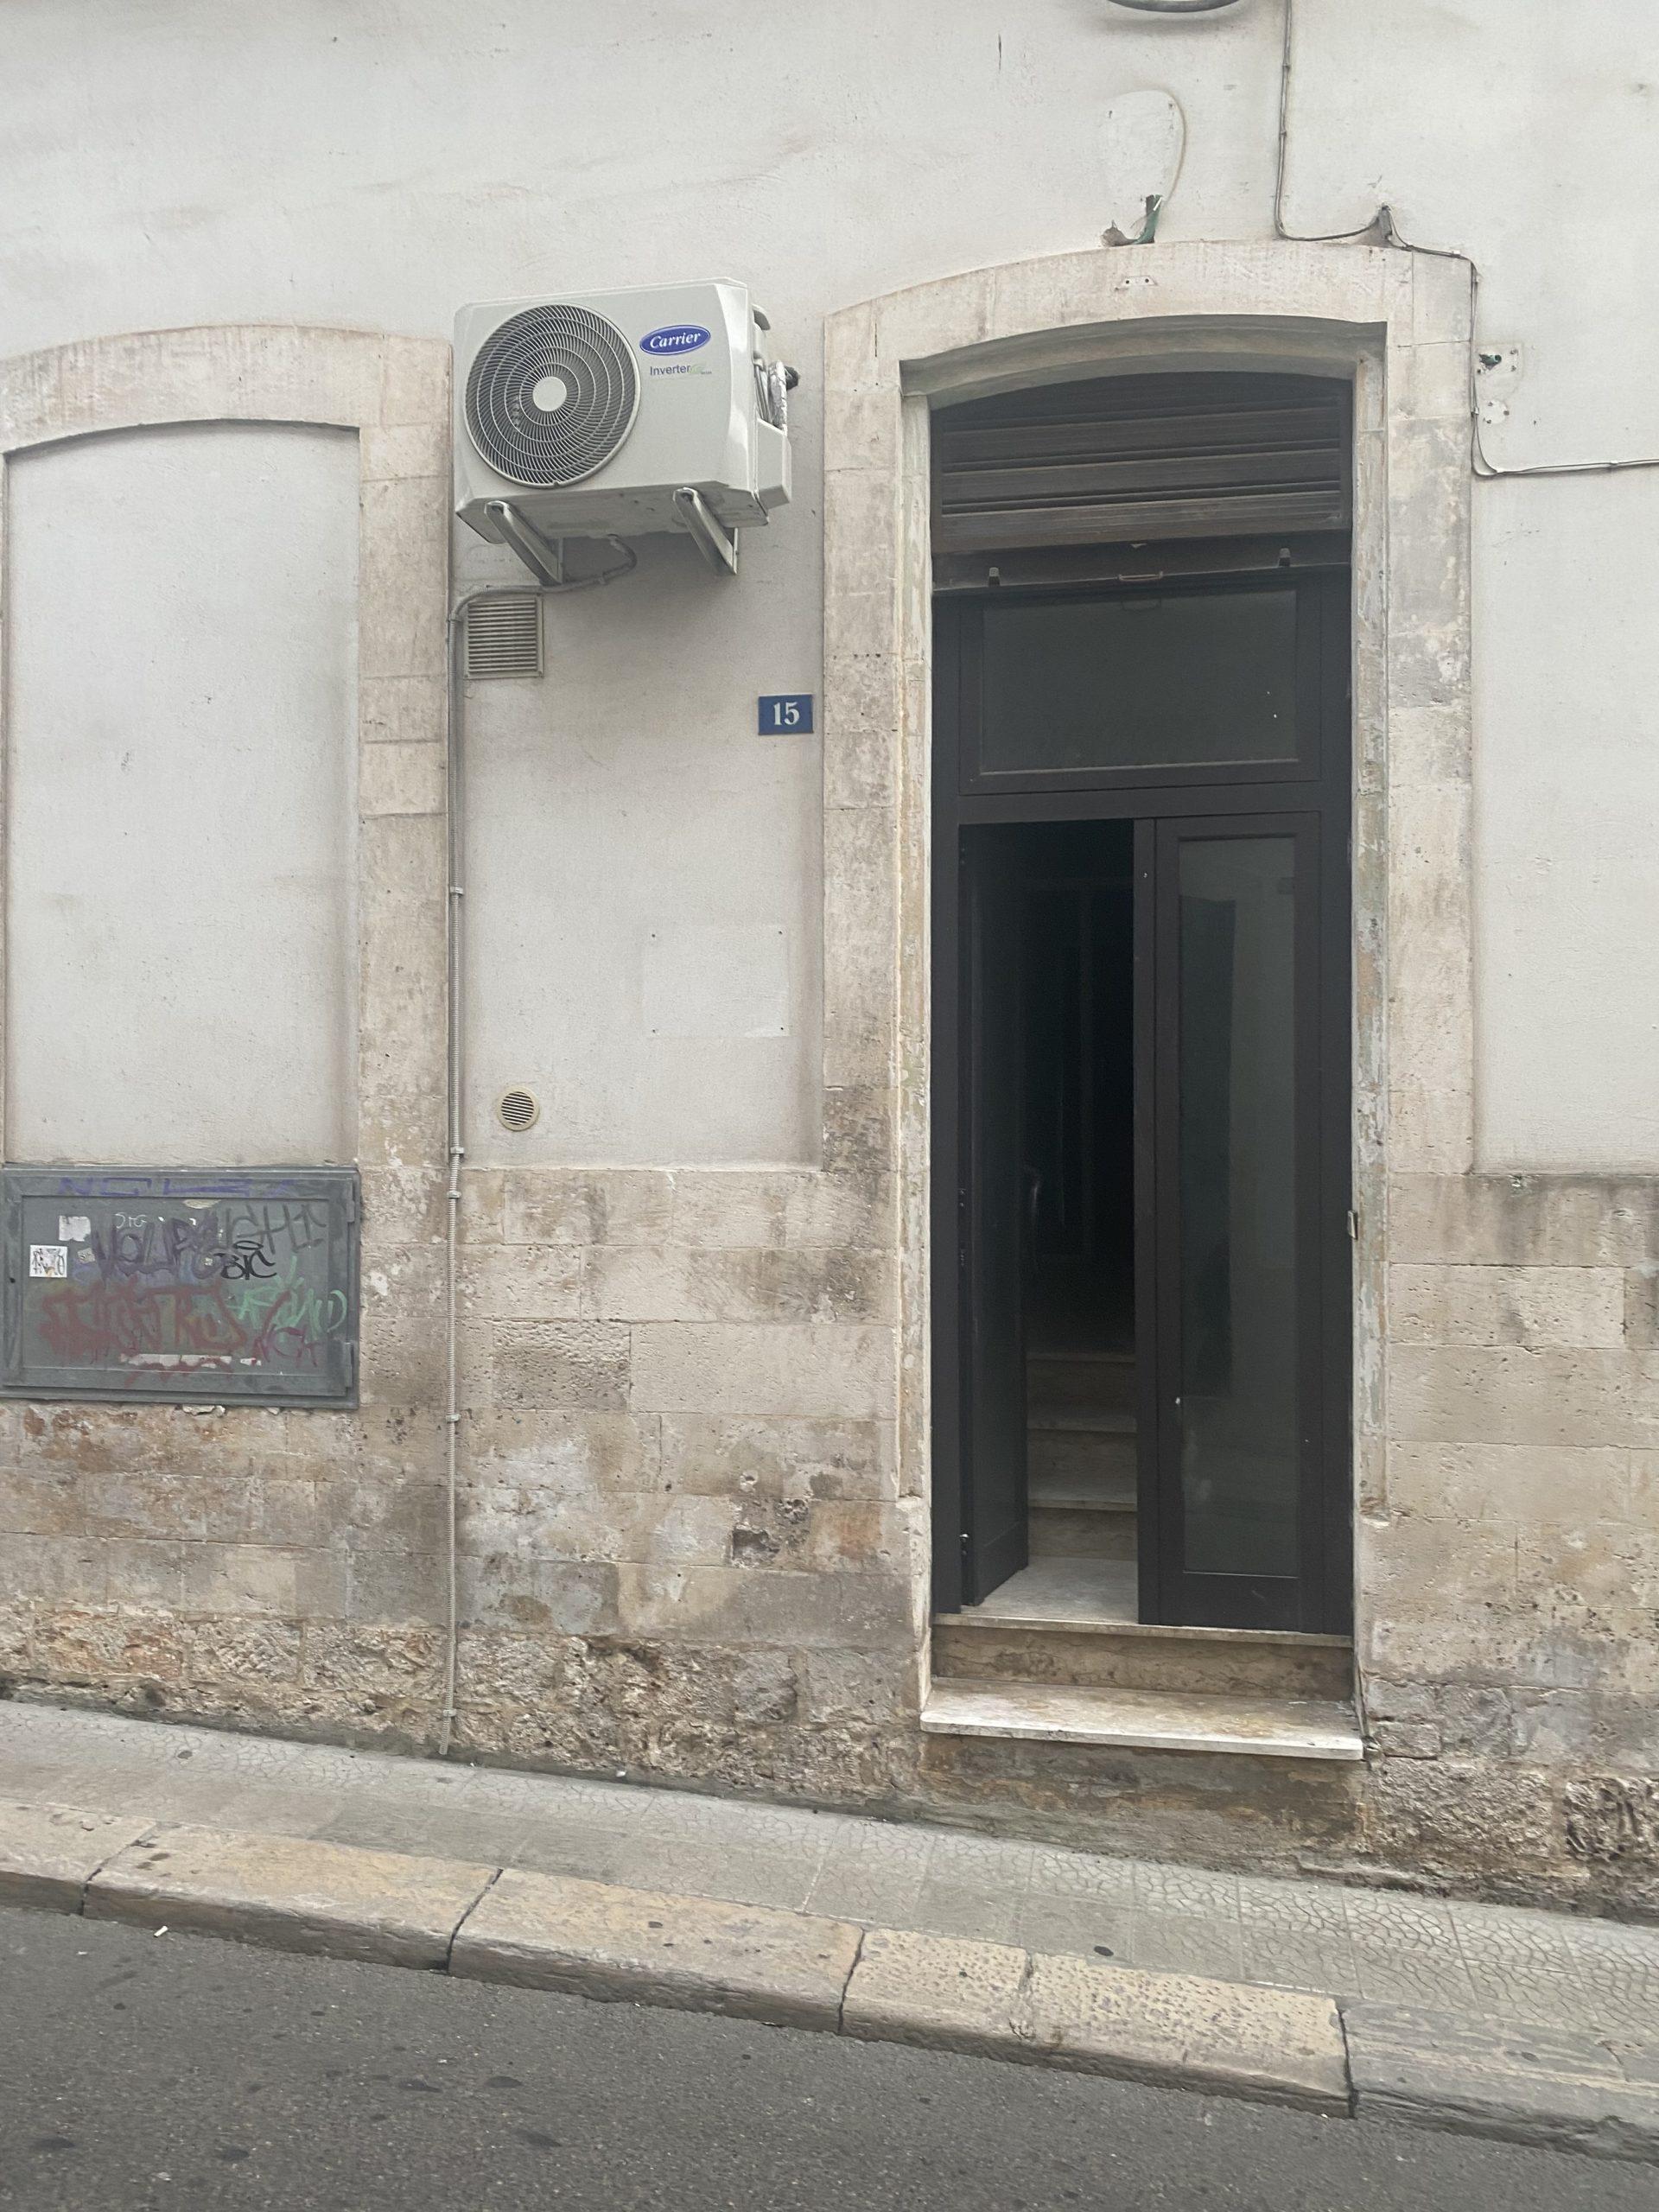 Via Abate Fighera 15 e Corso Italia 22 – Martina Franca